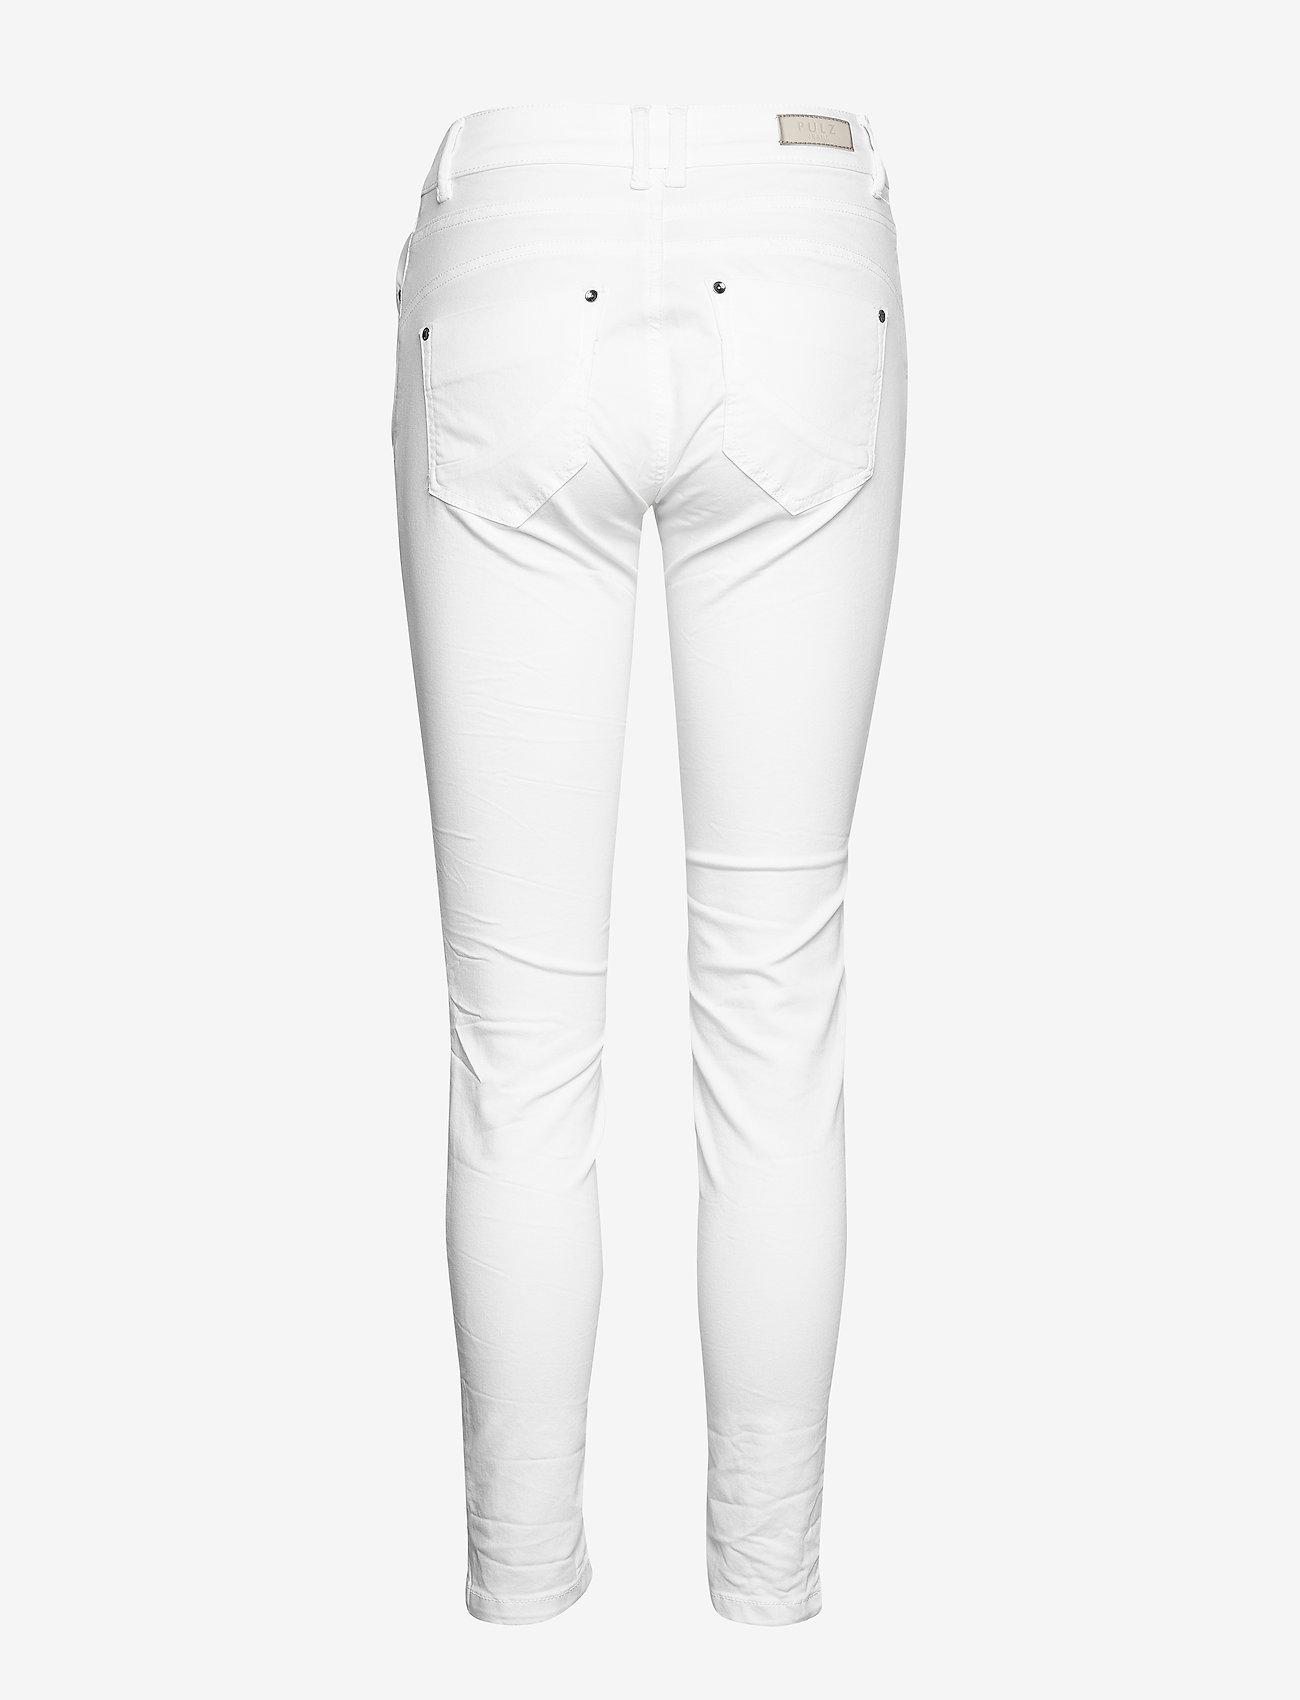 Pulz Jeans - PZROSITA PANT - skinny jeans - bright white - 1